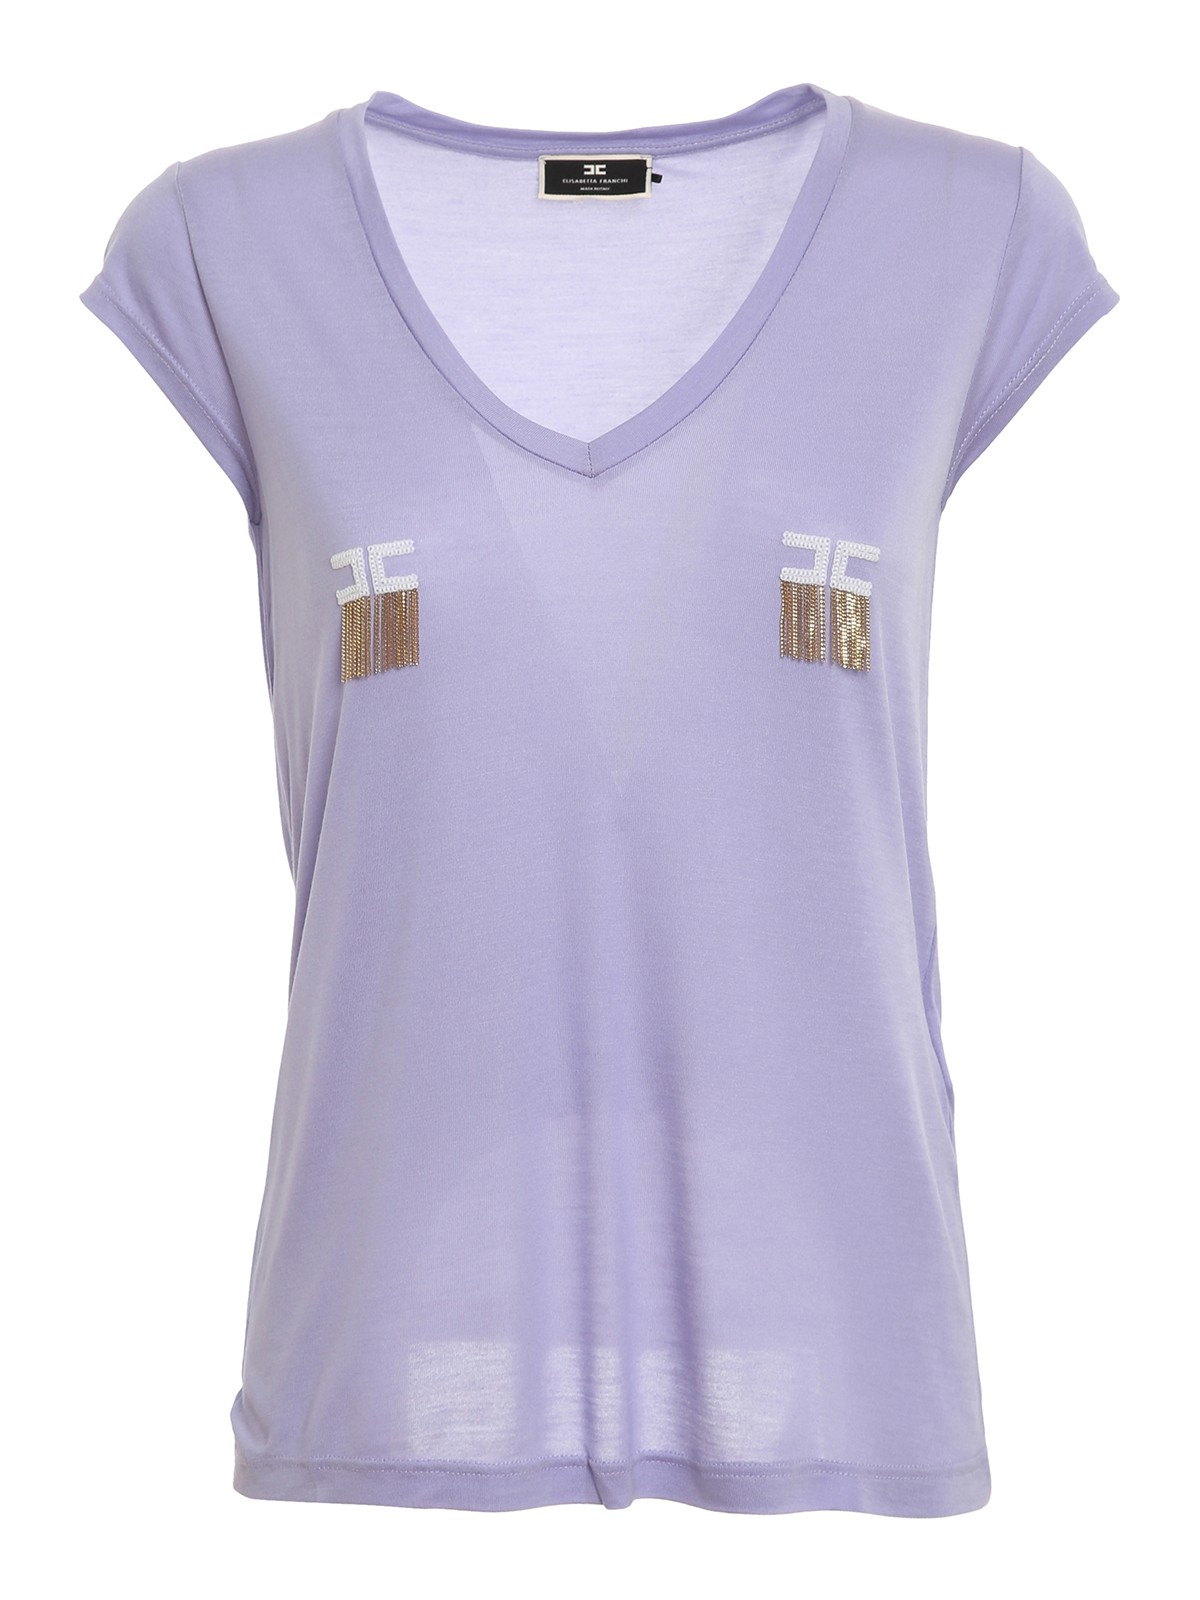 Elisabetta Franchi T-shirts CHAIN DETAILED LOGO T-SHIRT